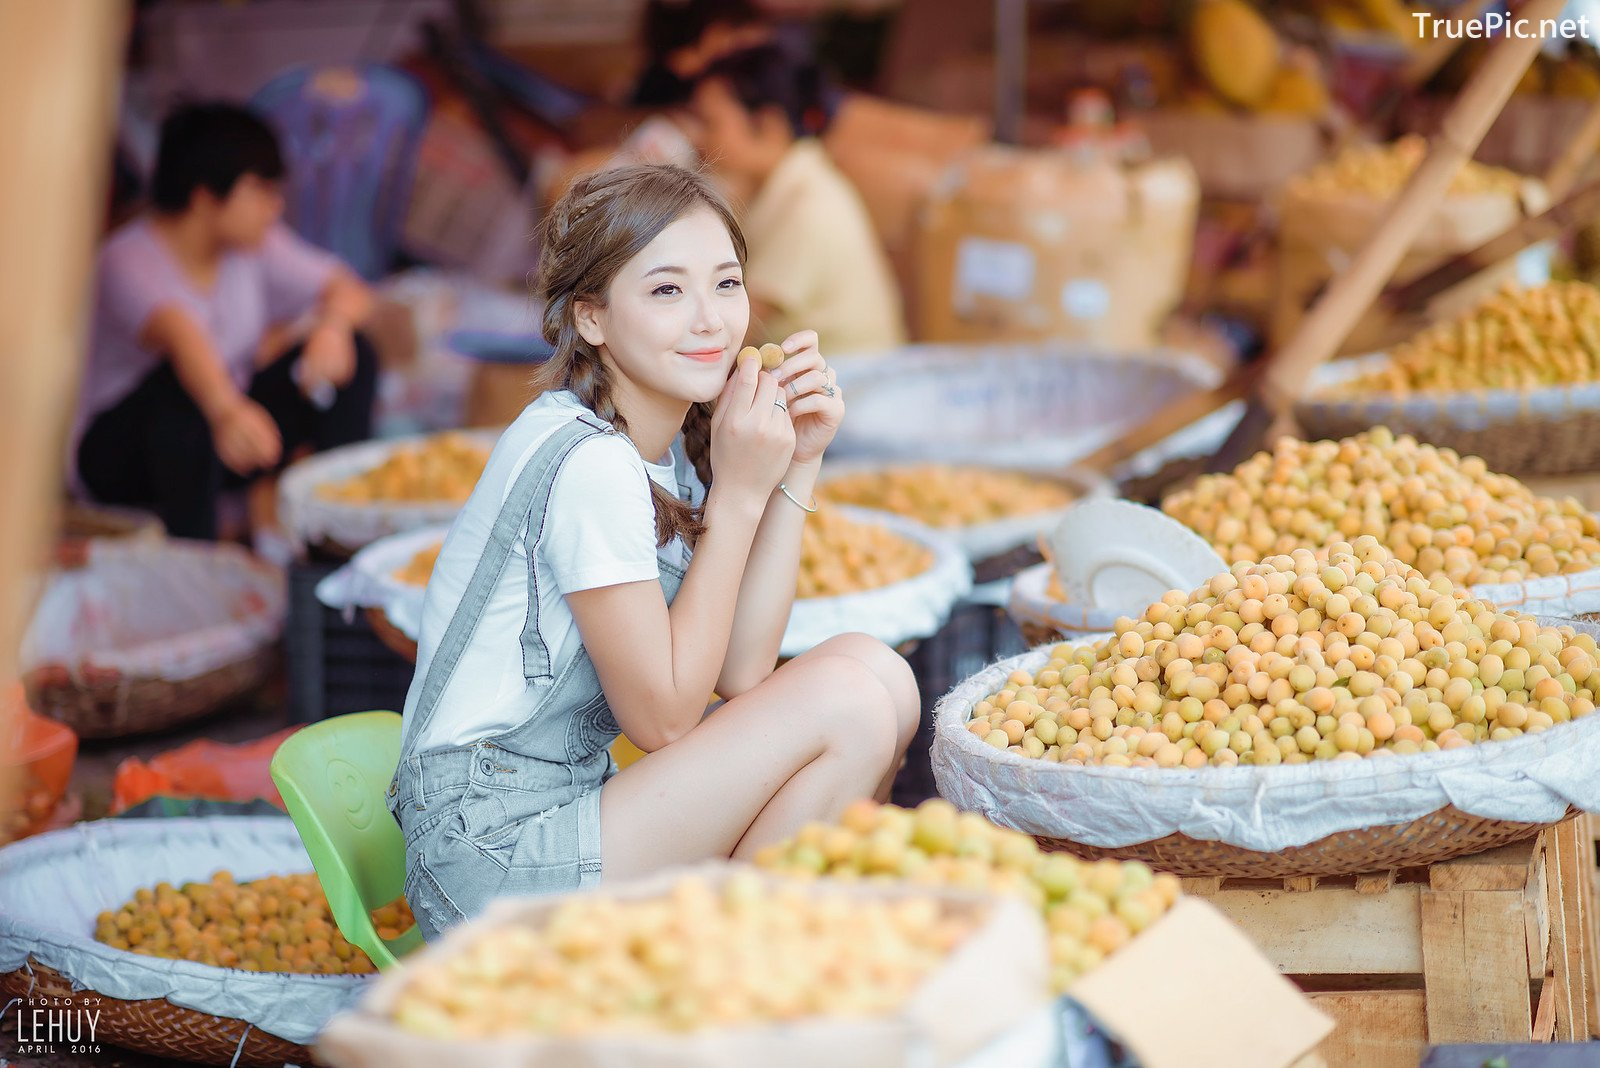 Image-Vietnamese-Hot-Girl-Photo-Album-Tomato-Little-Girl-Cute-TruePic.net- Picture-1